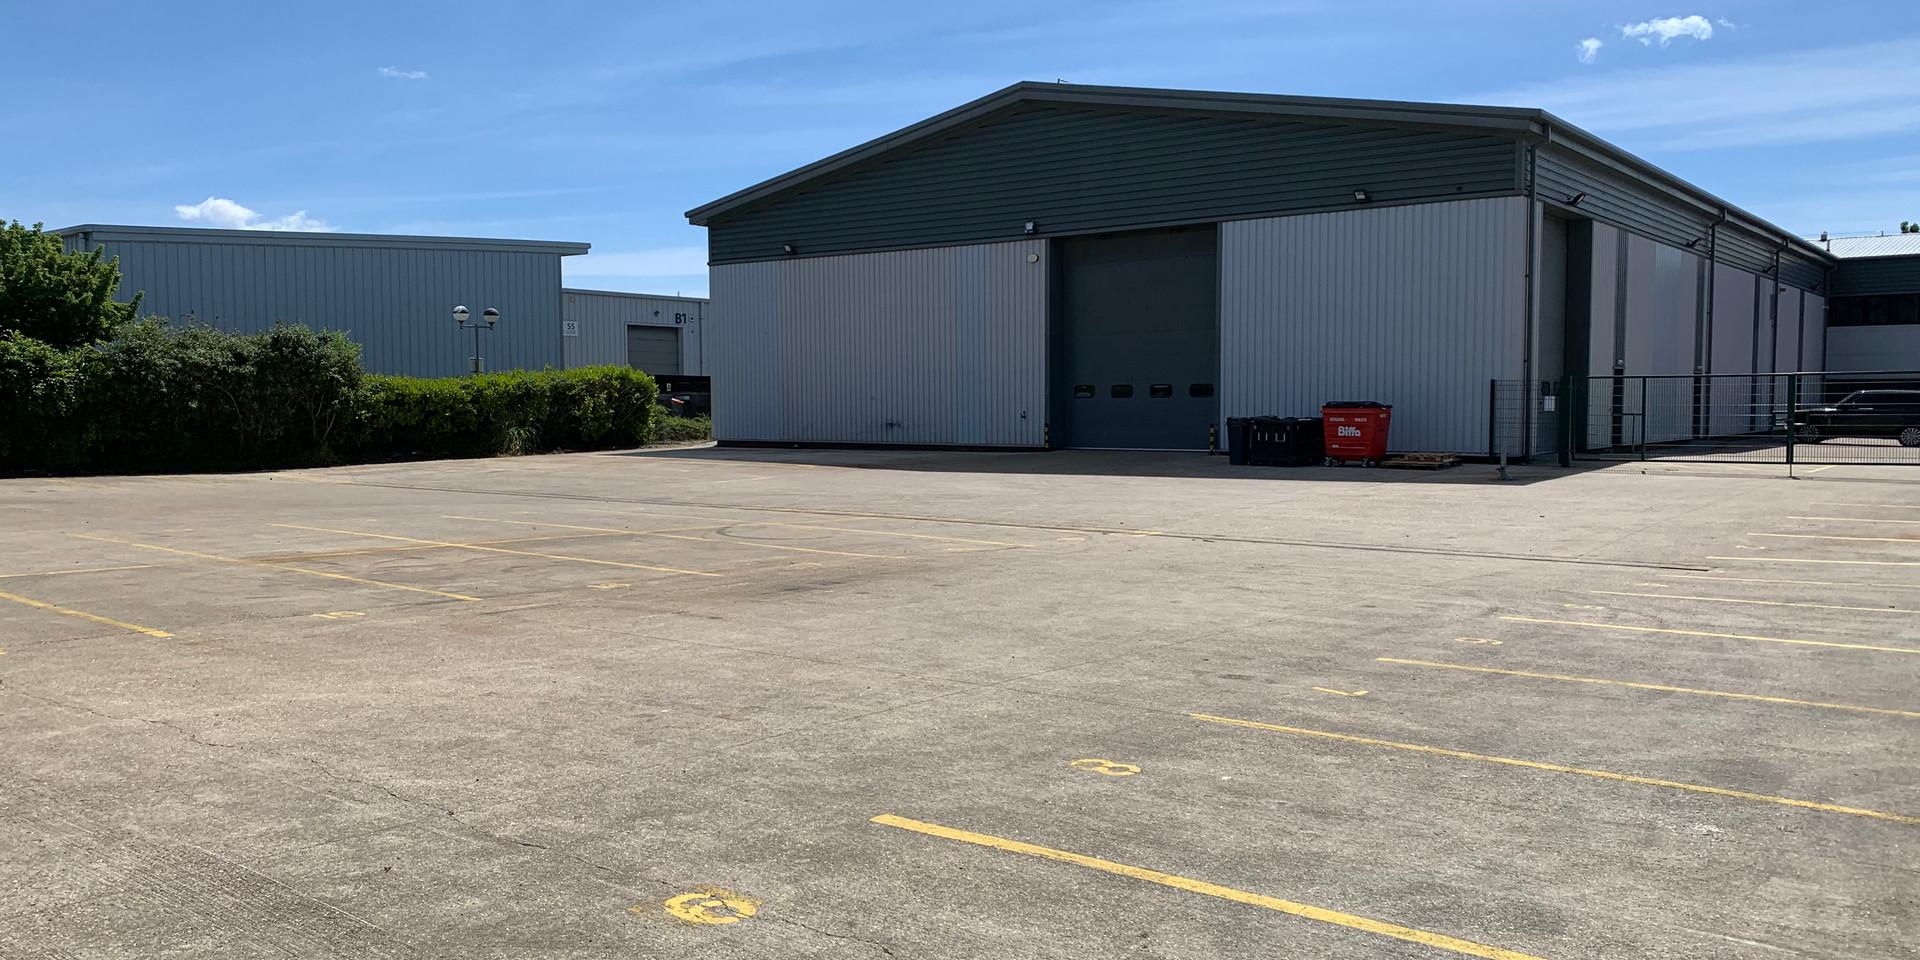 5 Penner Road, Rear Yard & Parking